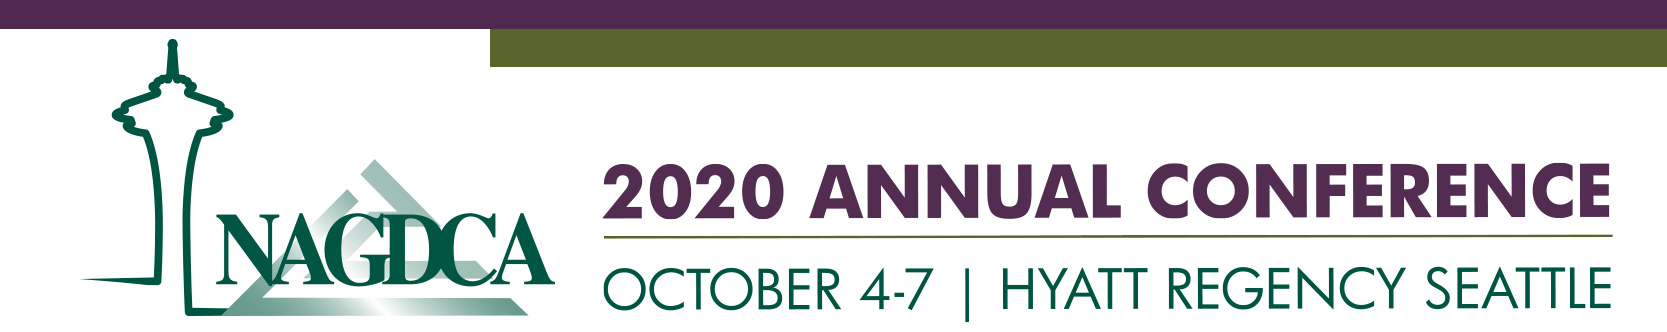 2020 Annual Banner